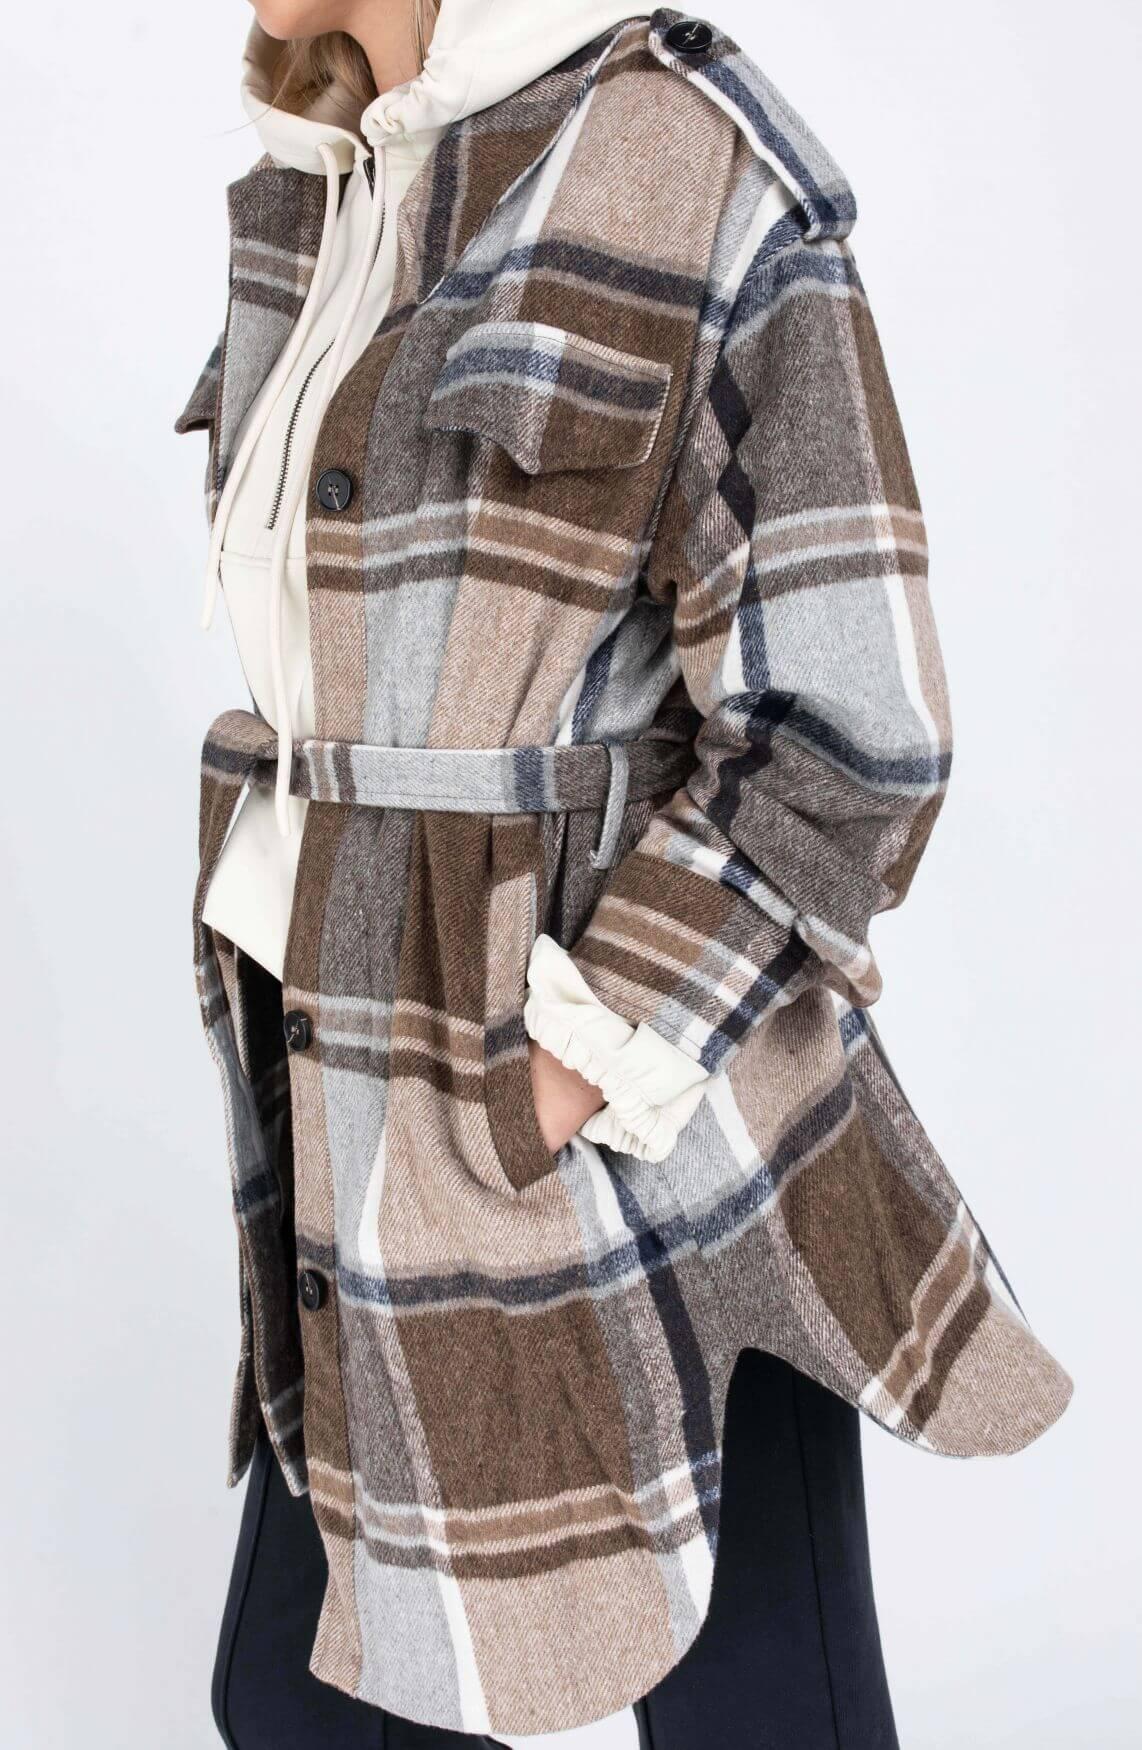 Co Couture Dames Maximilian overshirt Bruin